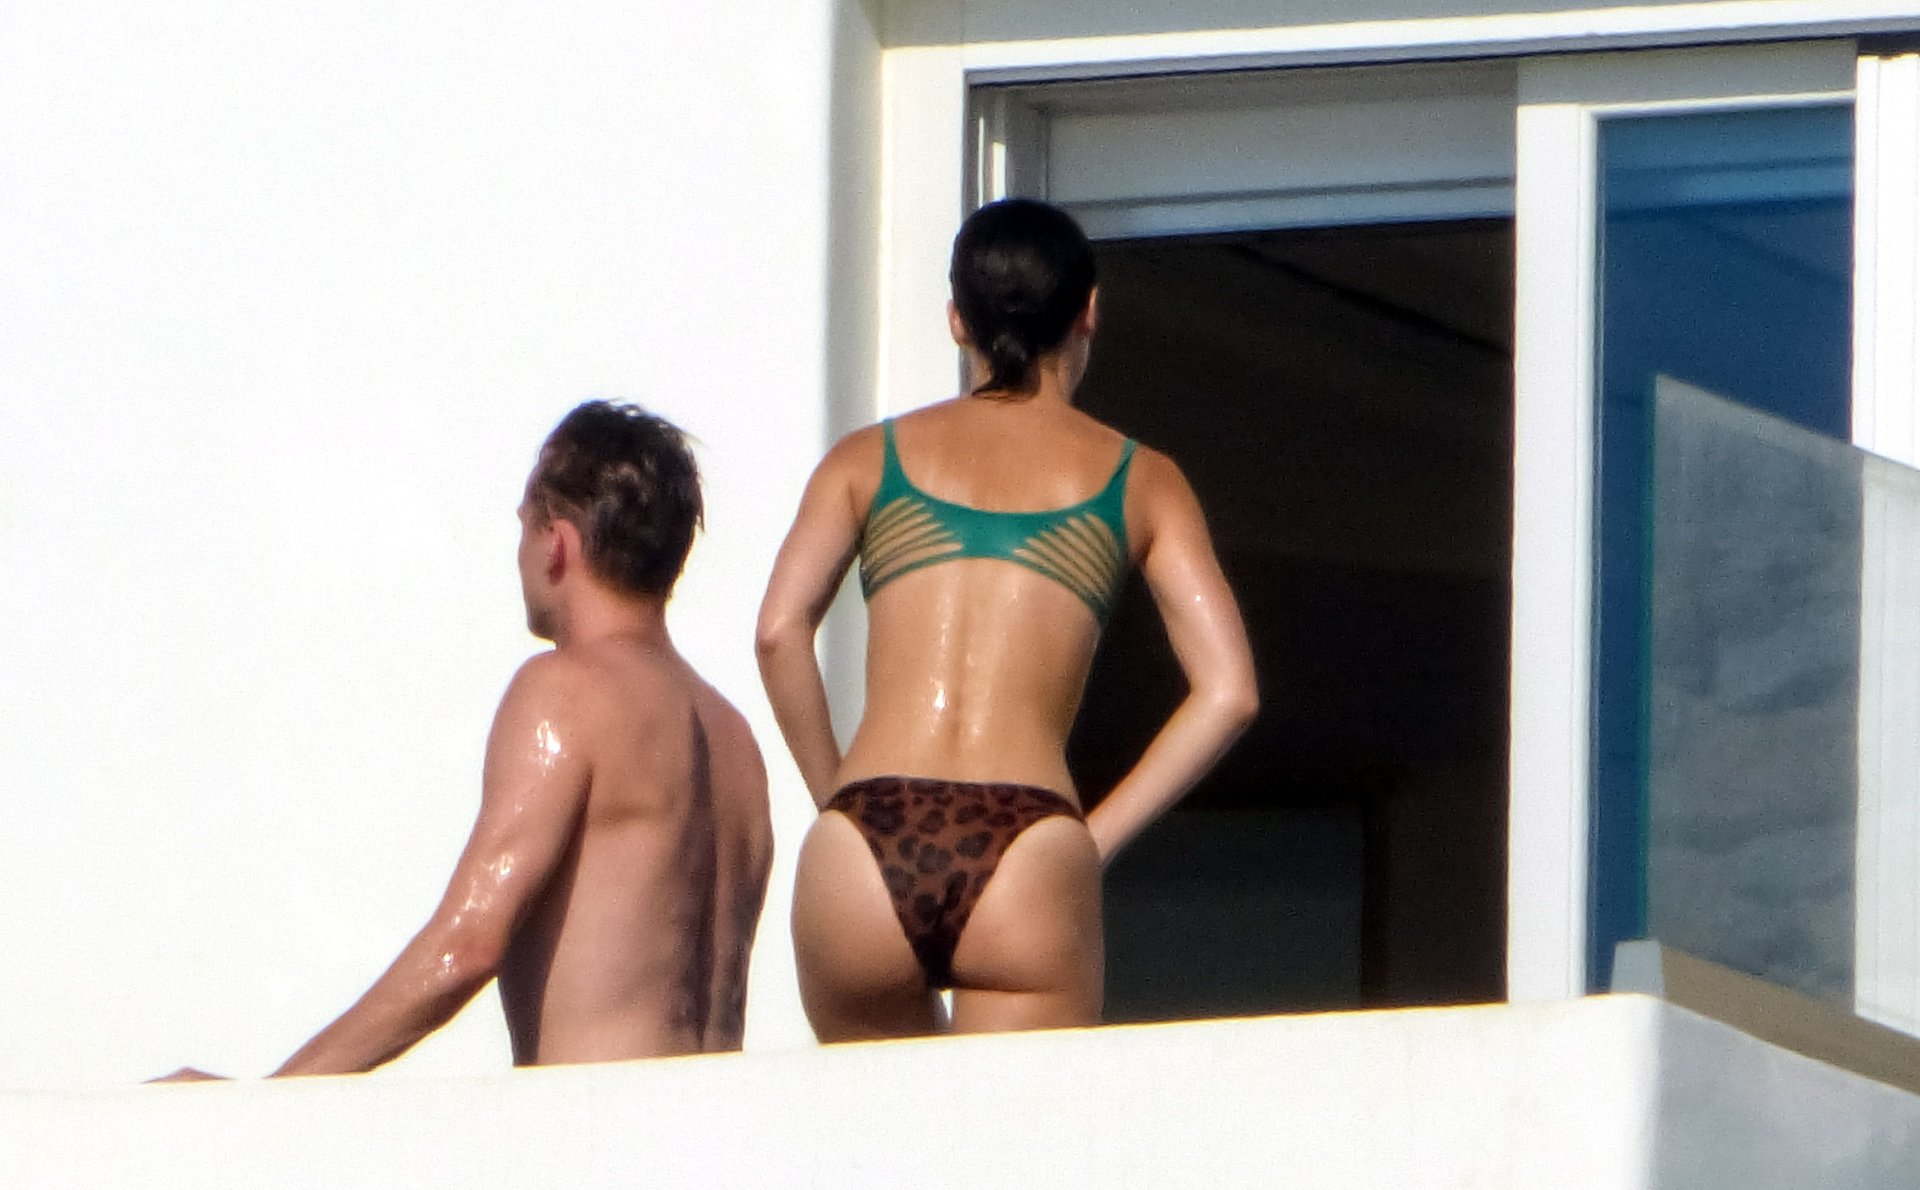 Lena Meyer-Landrut Sexy & Topless (21 Photos) | #TheFappening